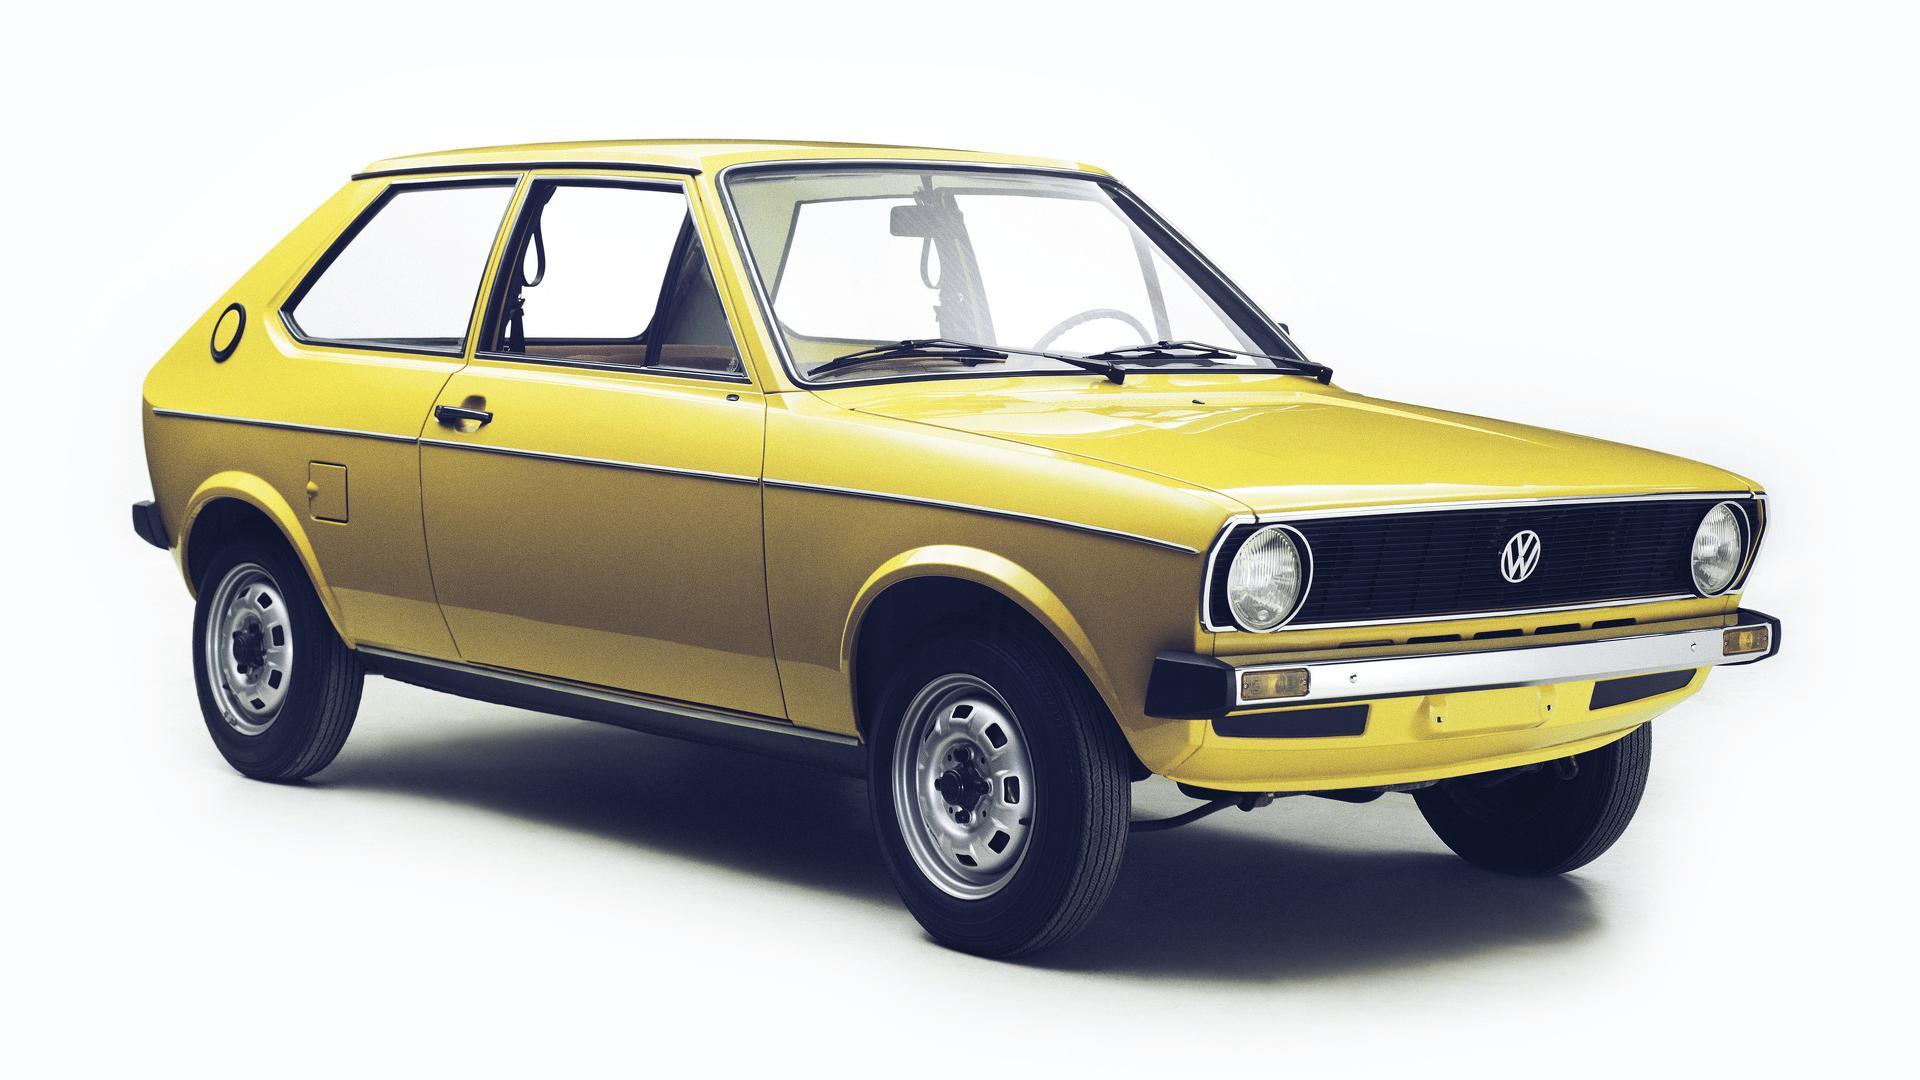 Foltswagen Polo - model history